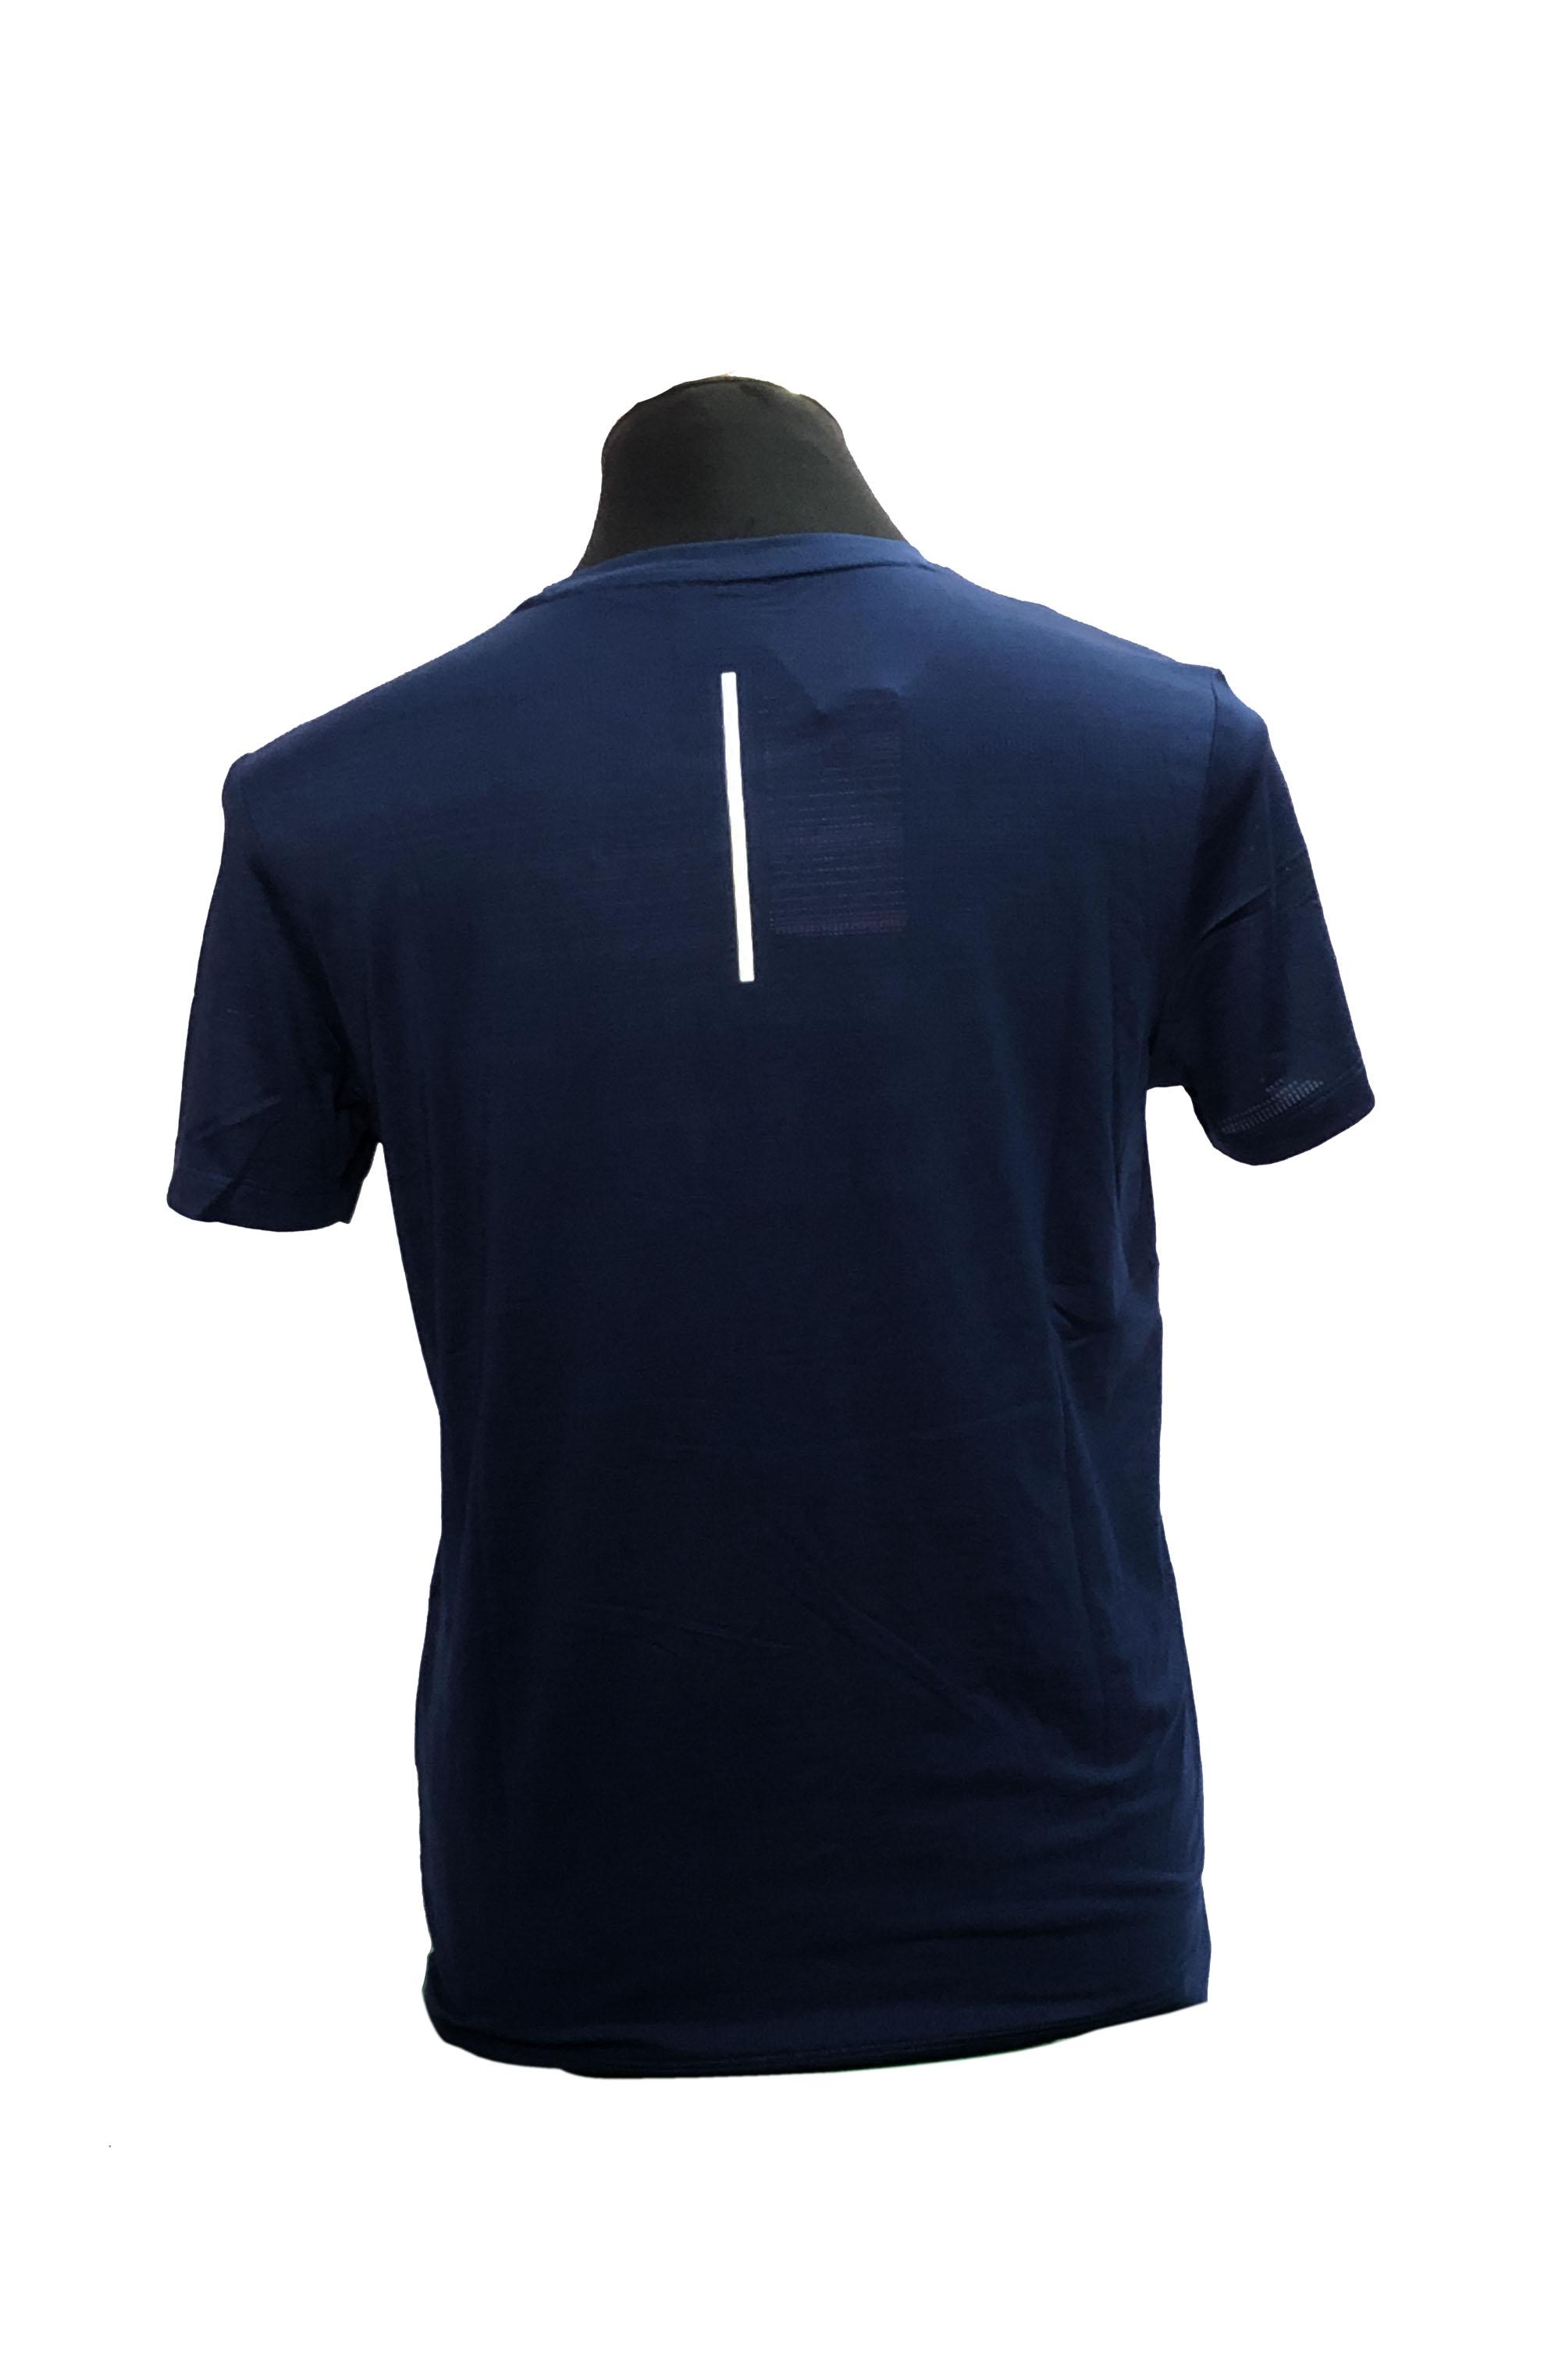 PEAK Round Neck T-Shirt For Men-FW602557 DK